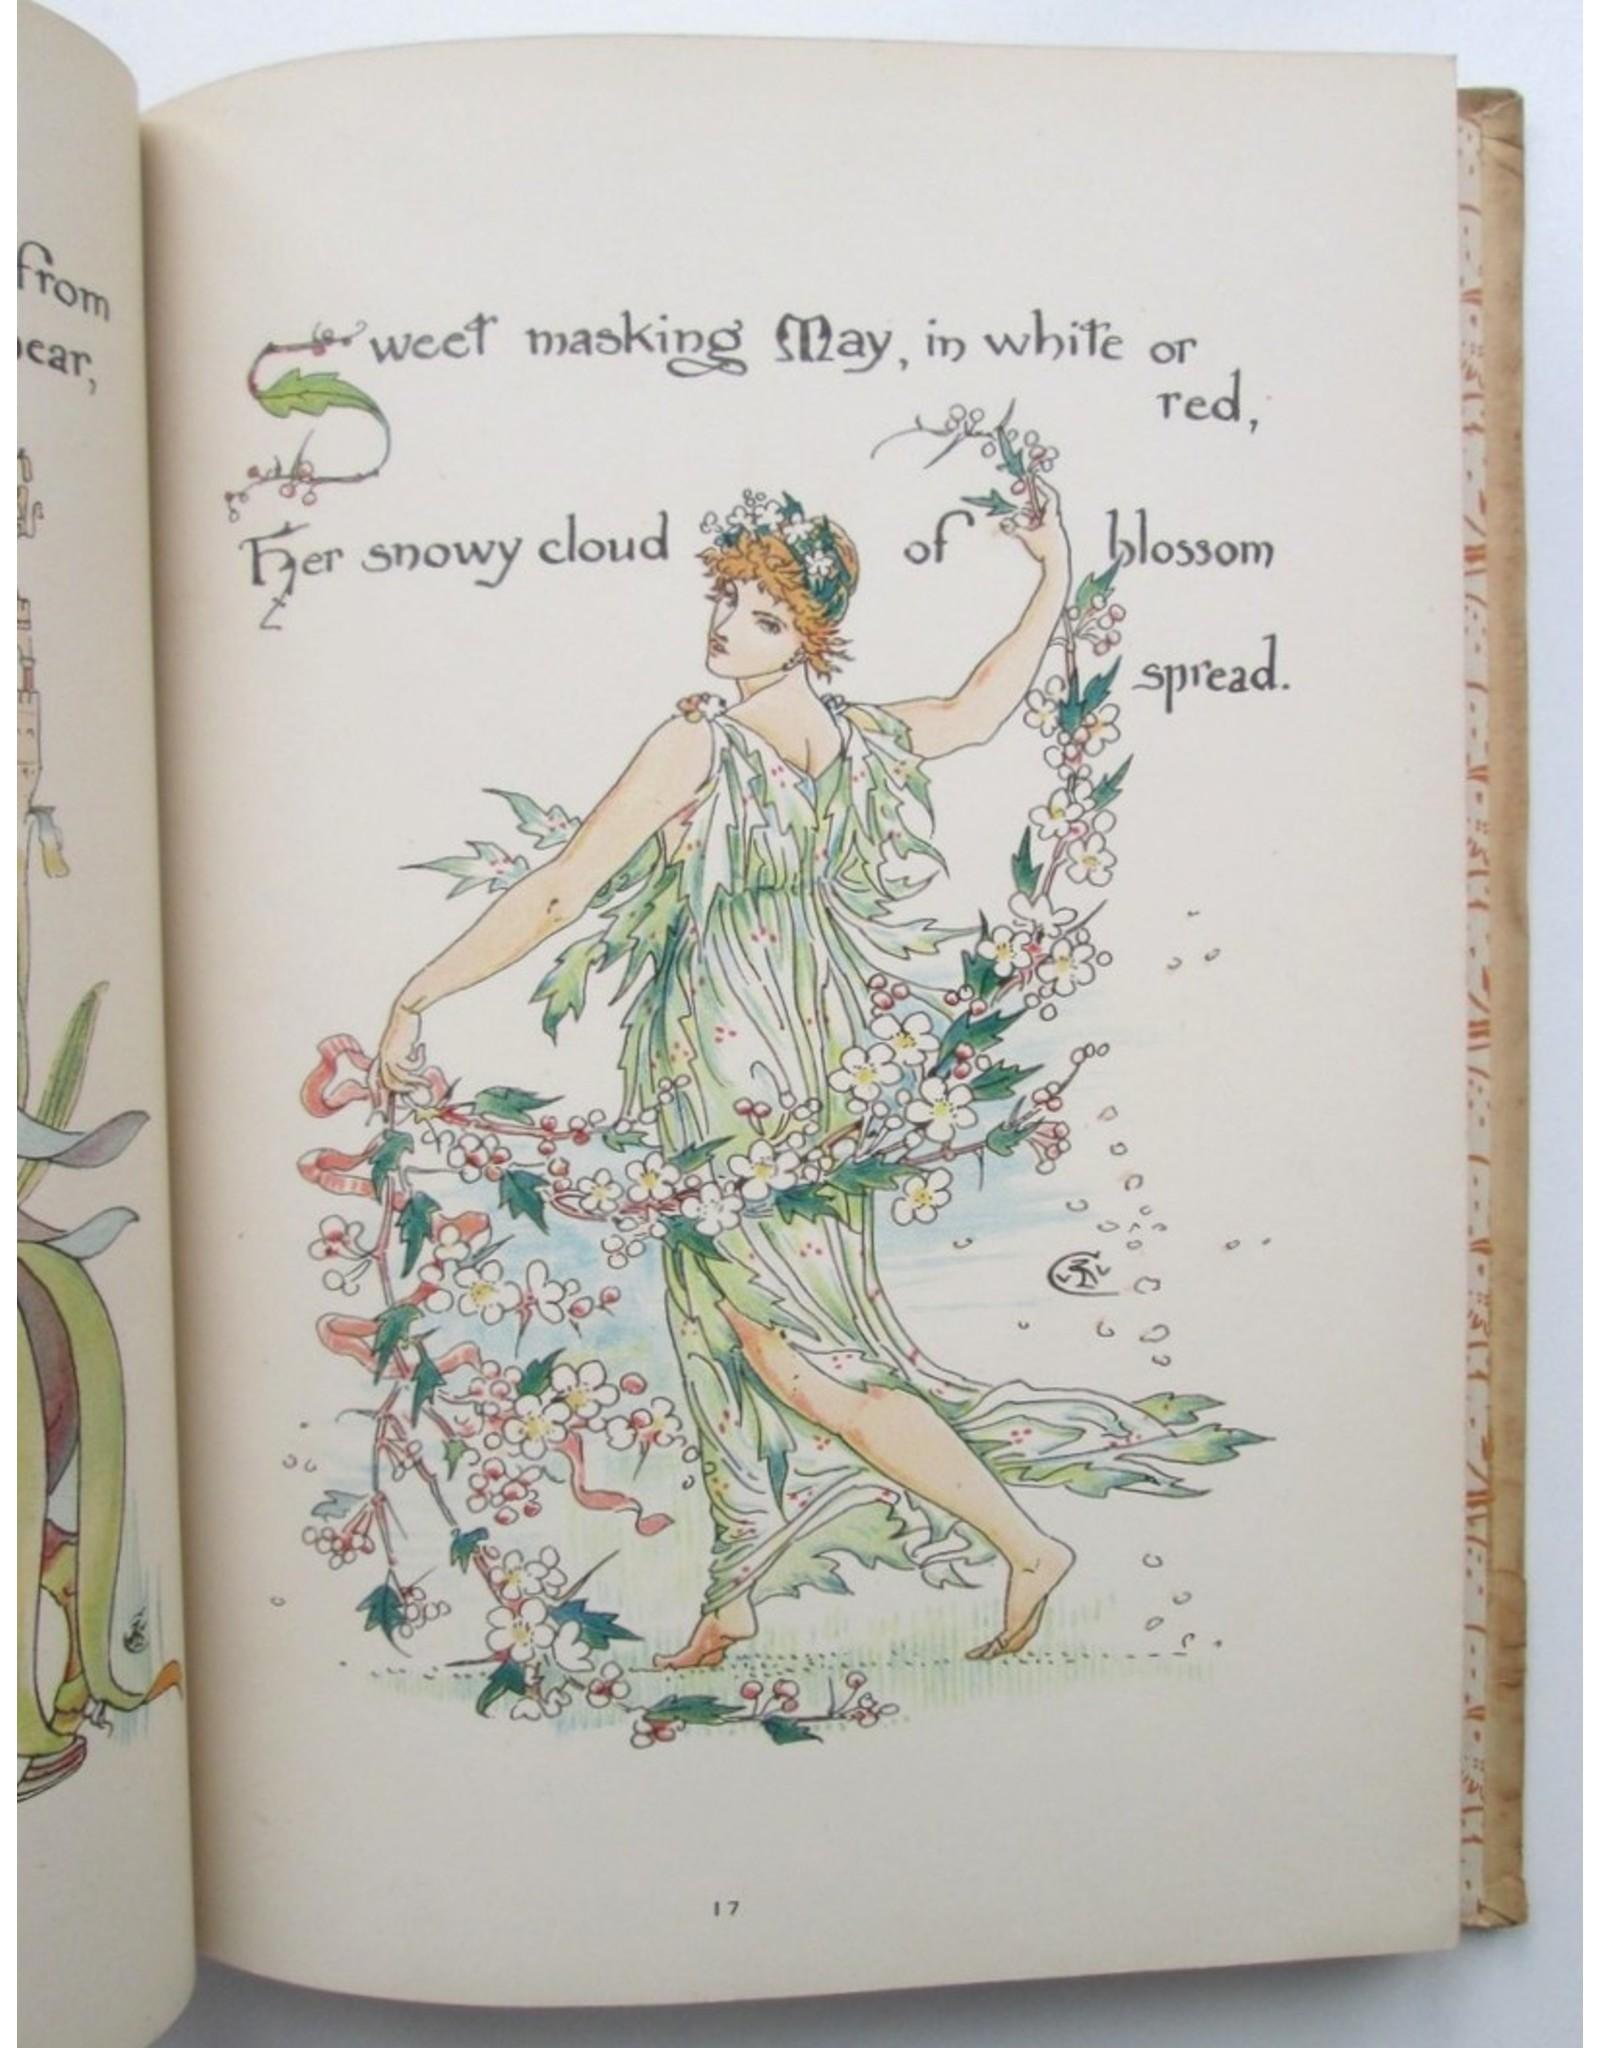 Walter Crane - Floras' Feast : A Masque of Flowers